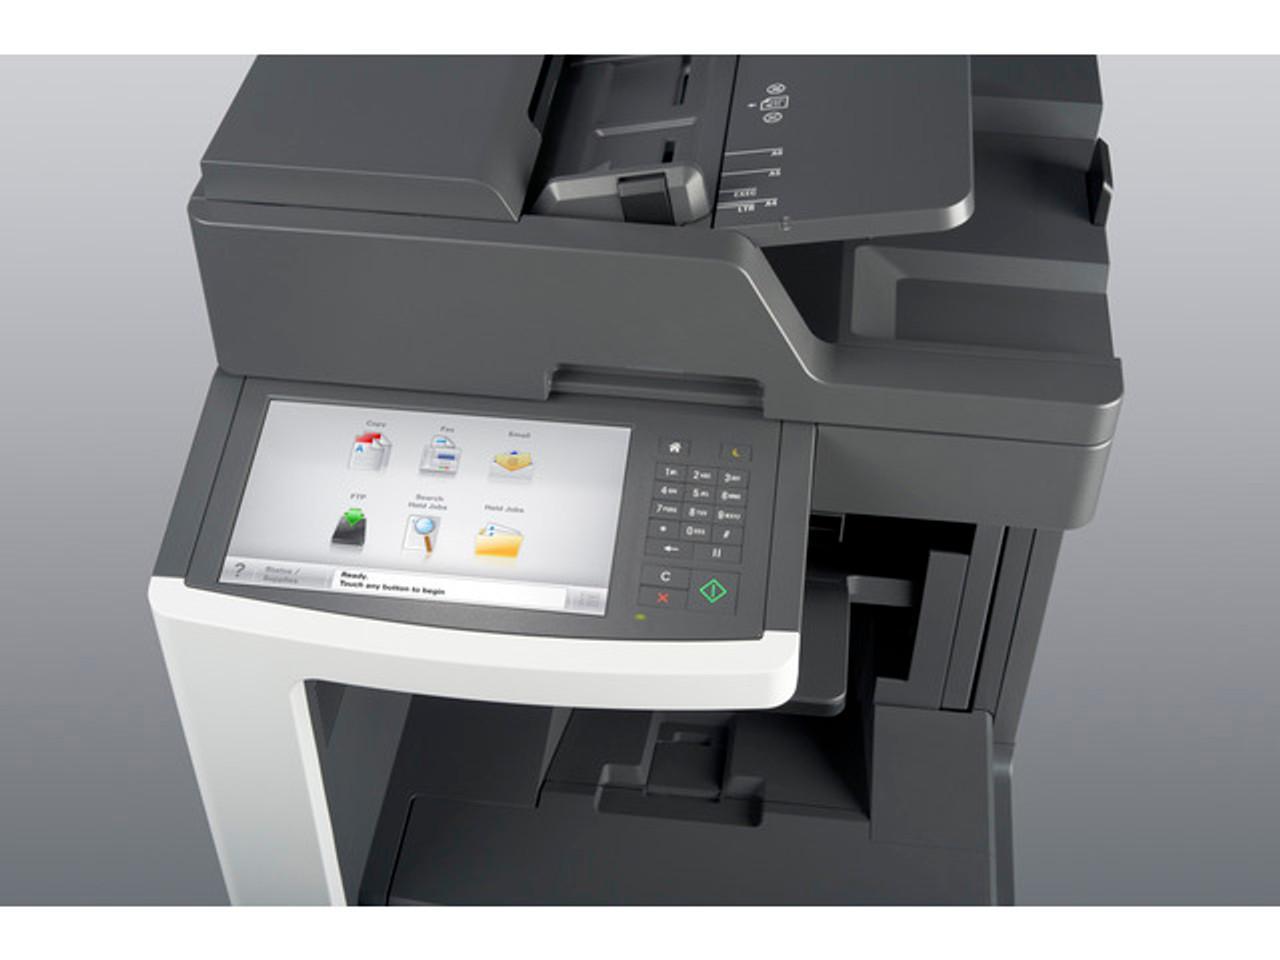 Lexmark MX810de Monochrome Laser - Fax/copier/printer/scanner